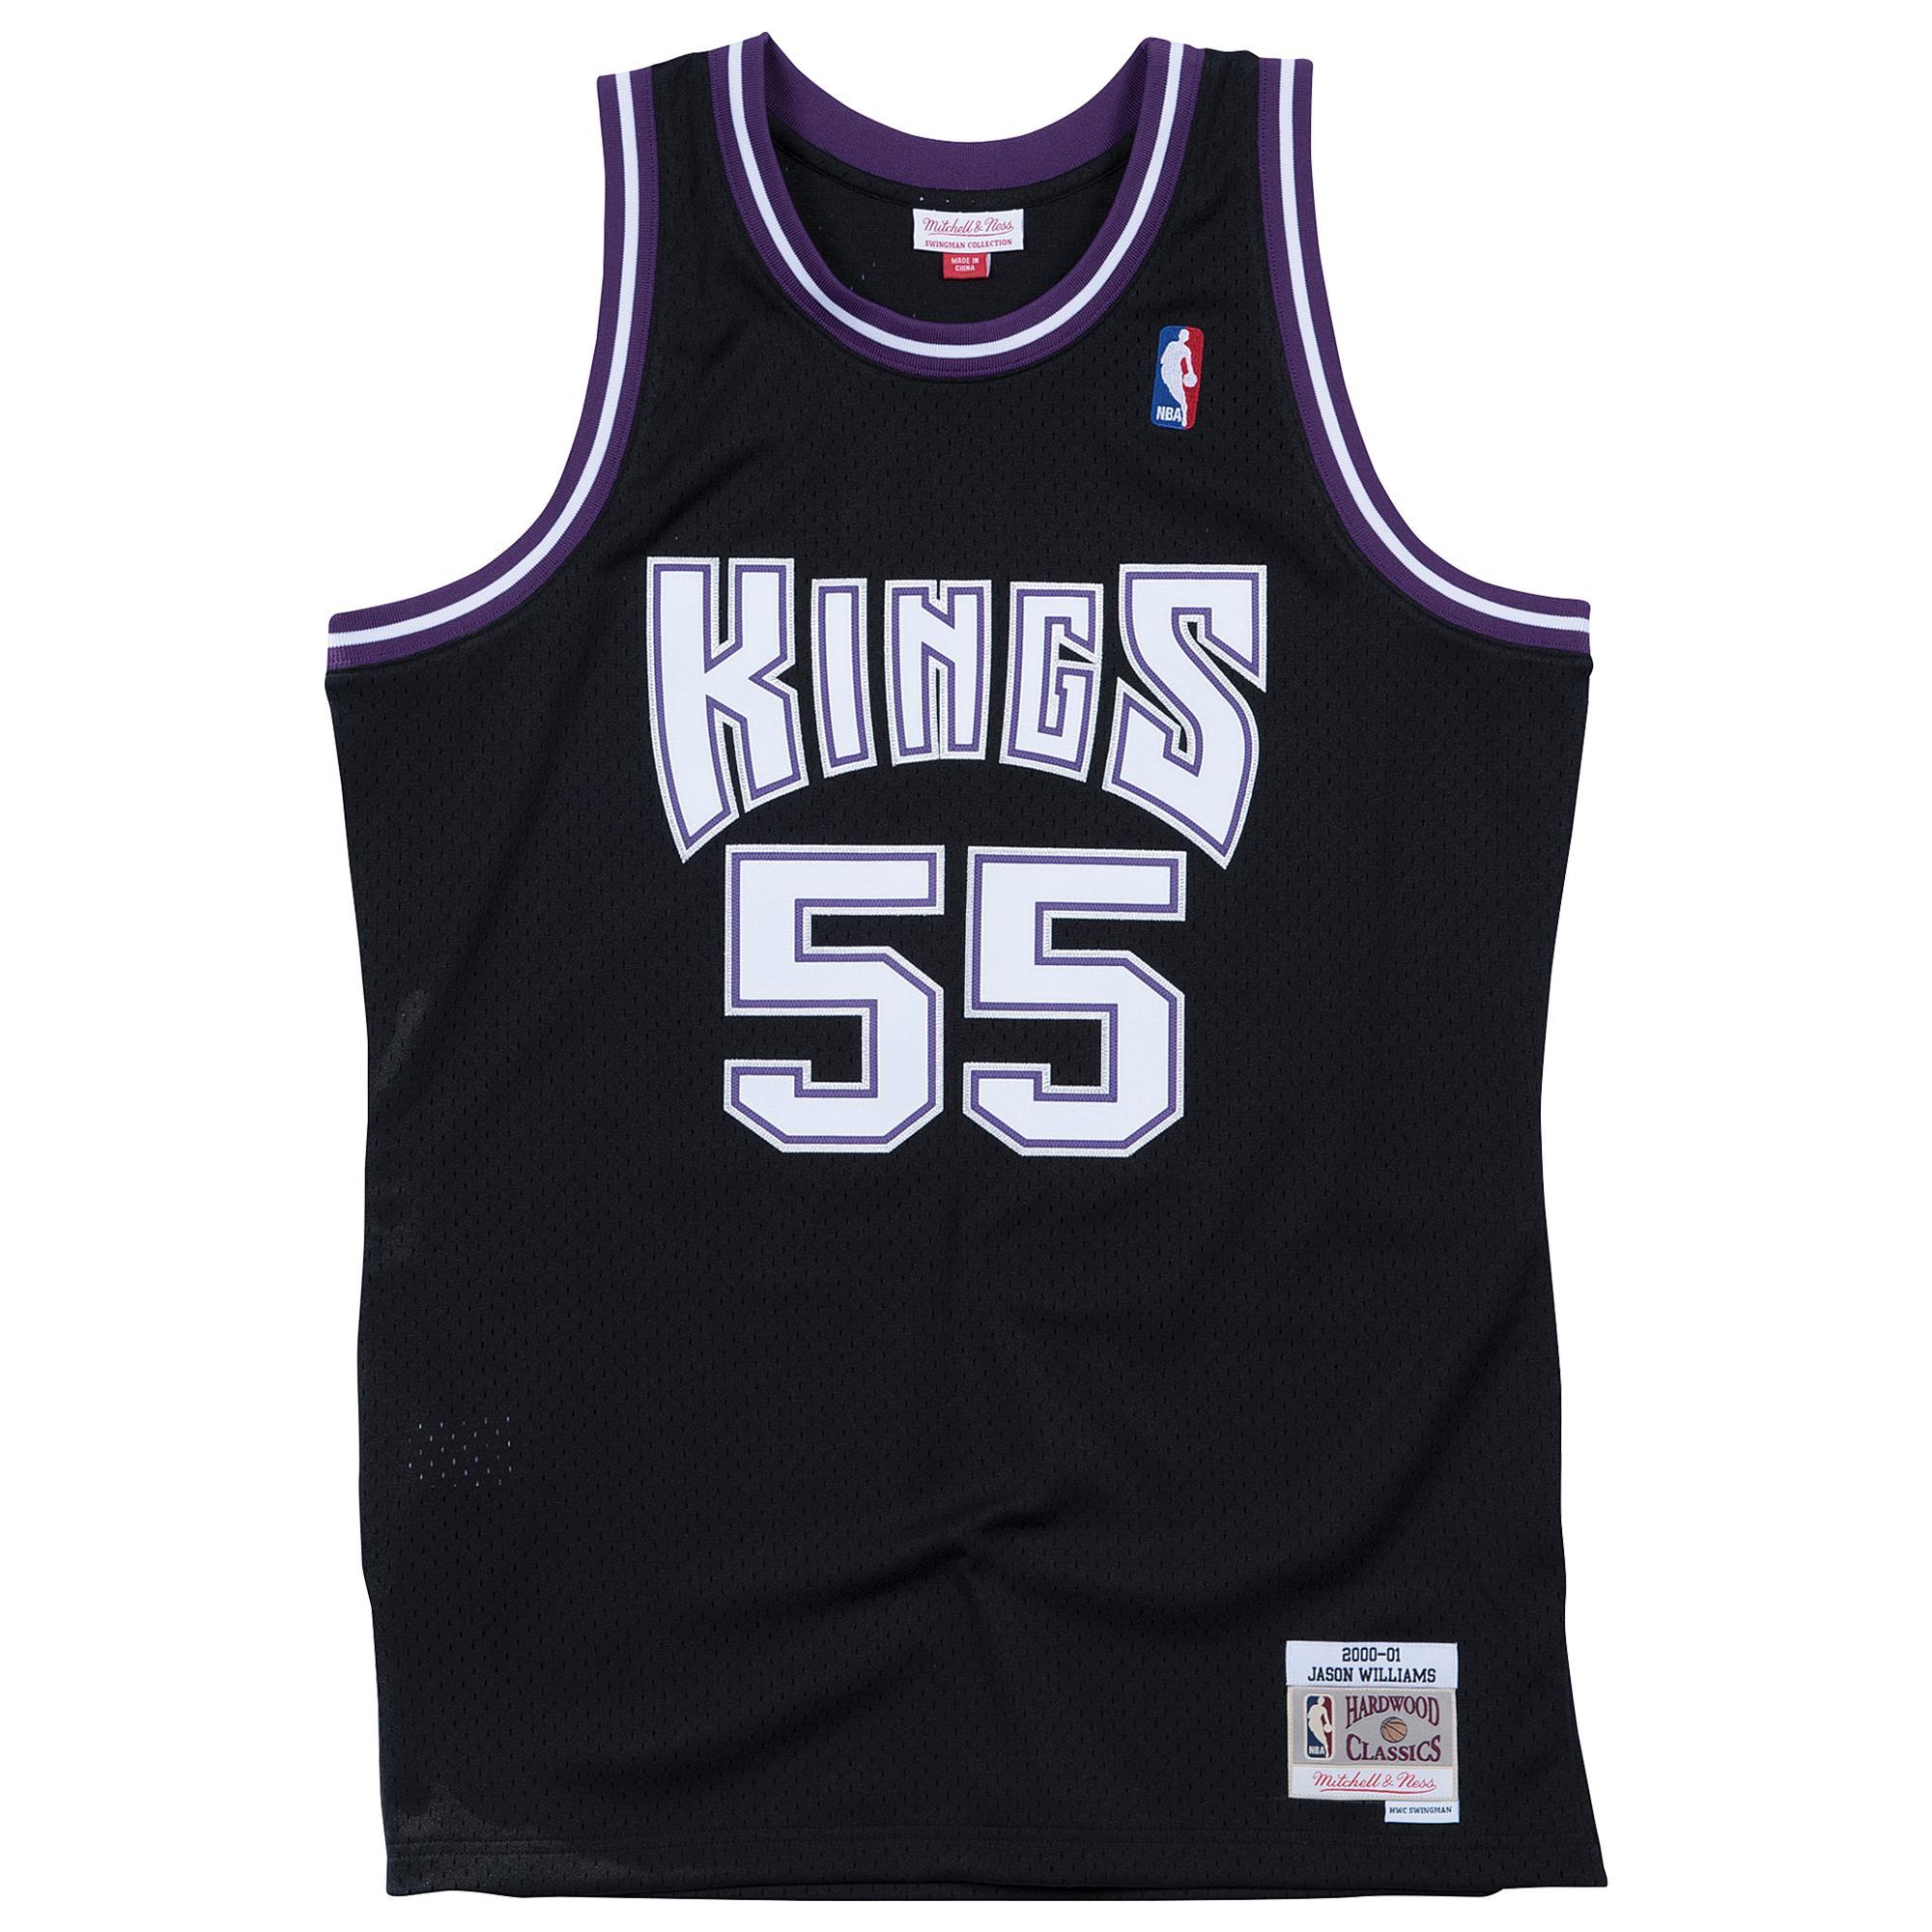 online store 60853 5ad9b Mitchell & Ness Jason Williams Nba Swingman Jersey in Black ...